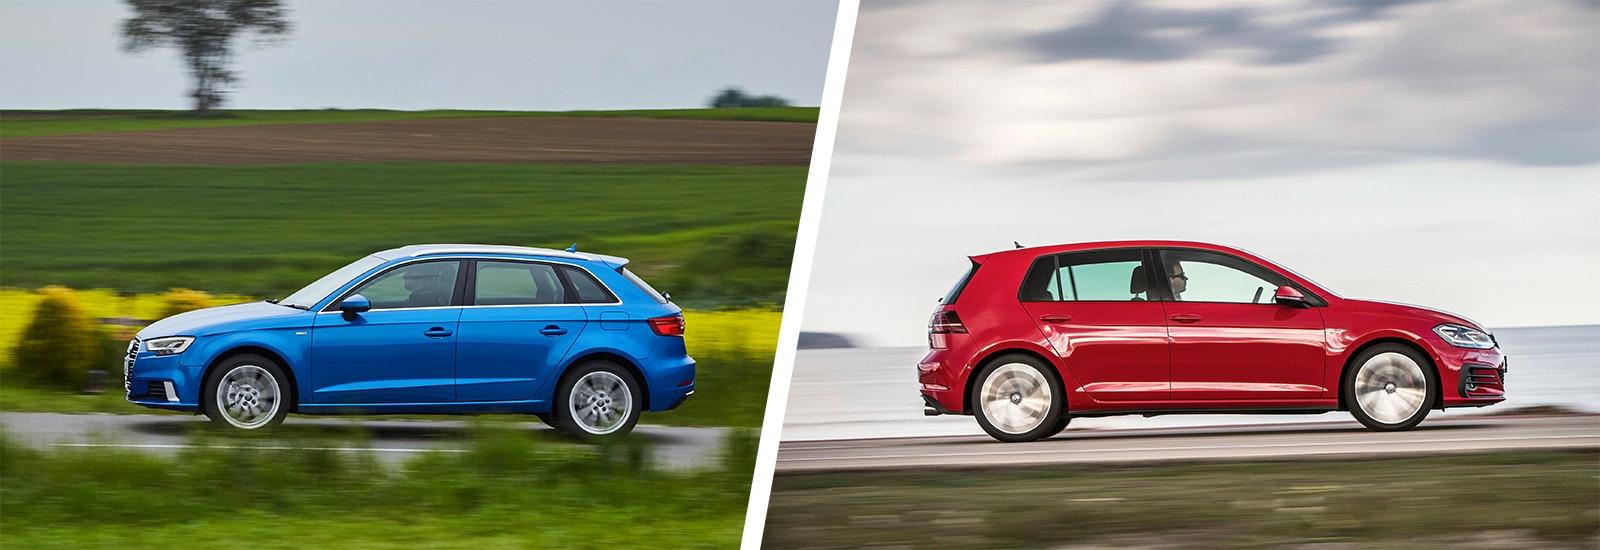 audi a3 vs vw golf side by side comparison carwow rh carwow co uk Audi A3 Owner Manual Audi A3 Manual PDF